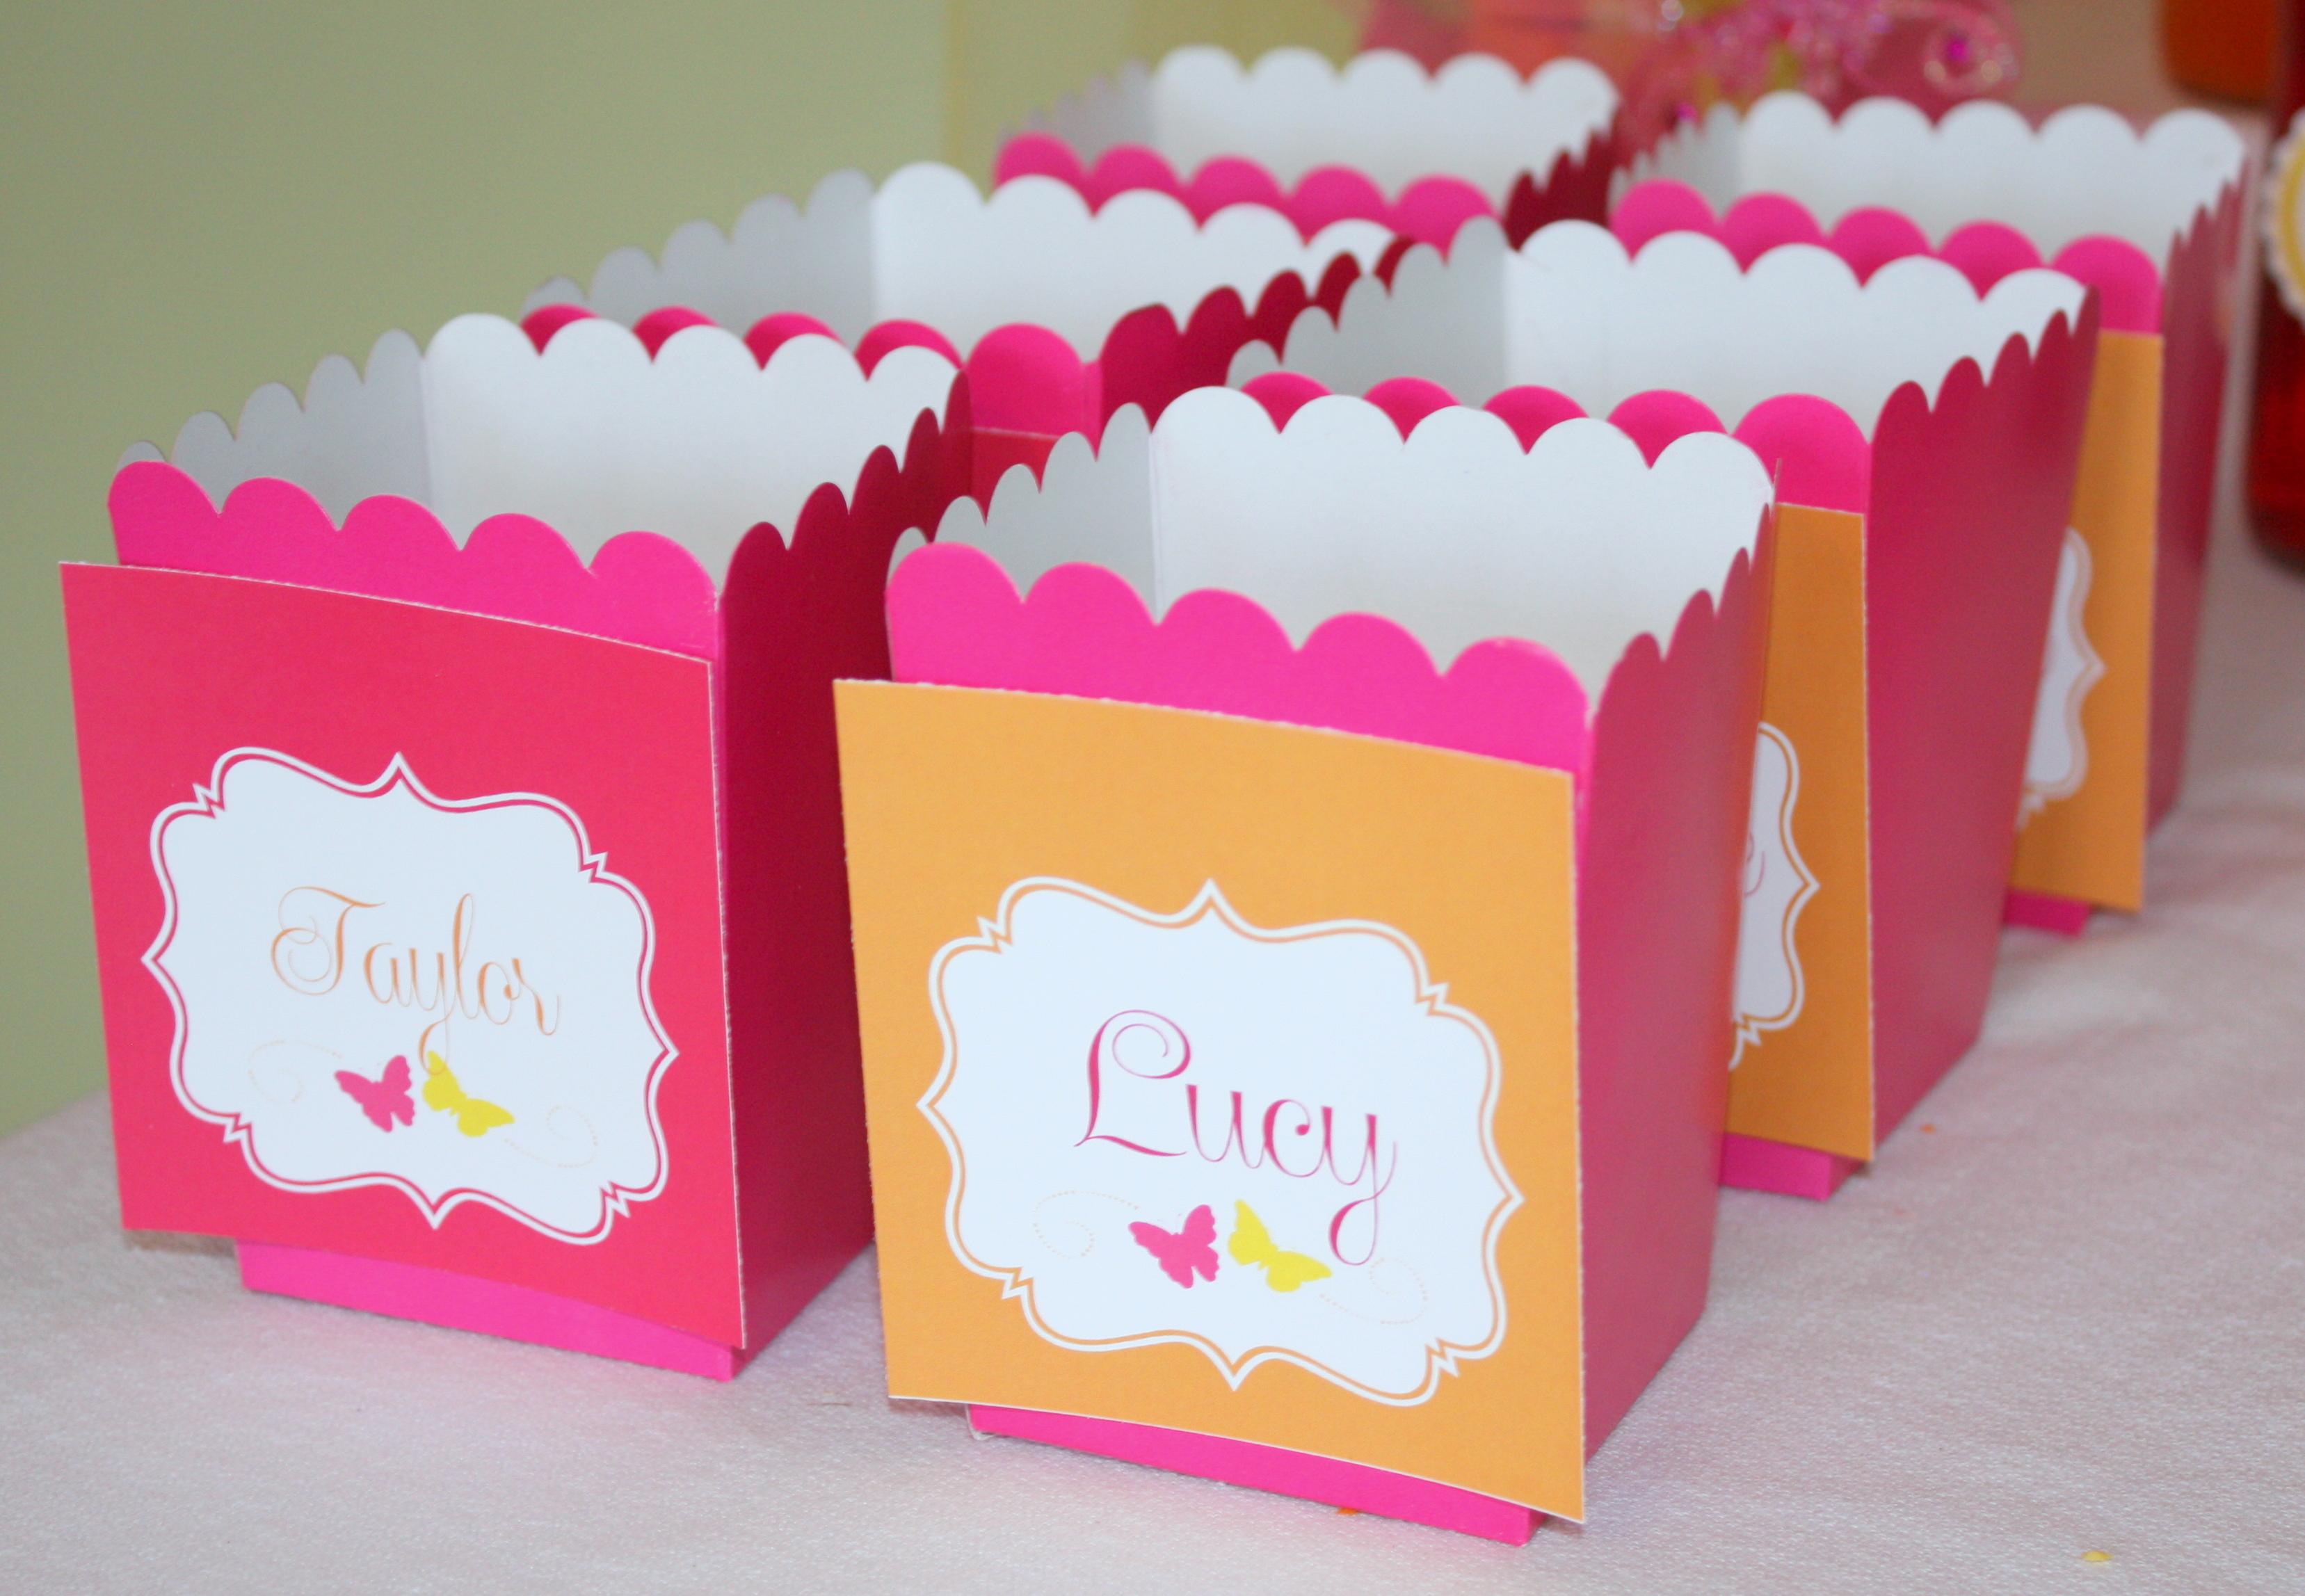 Hobby Lobby Invitation Templates was luxury invitation template